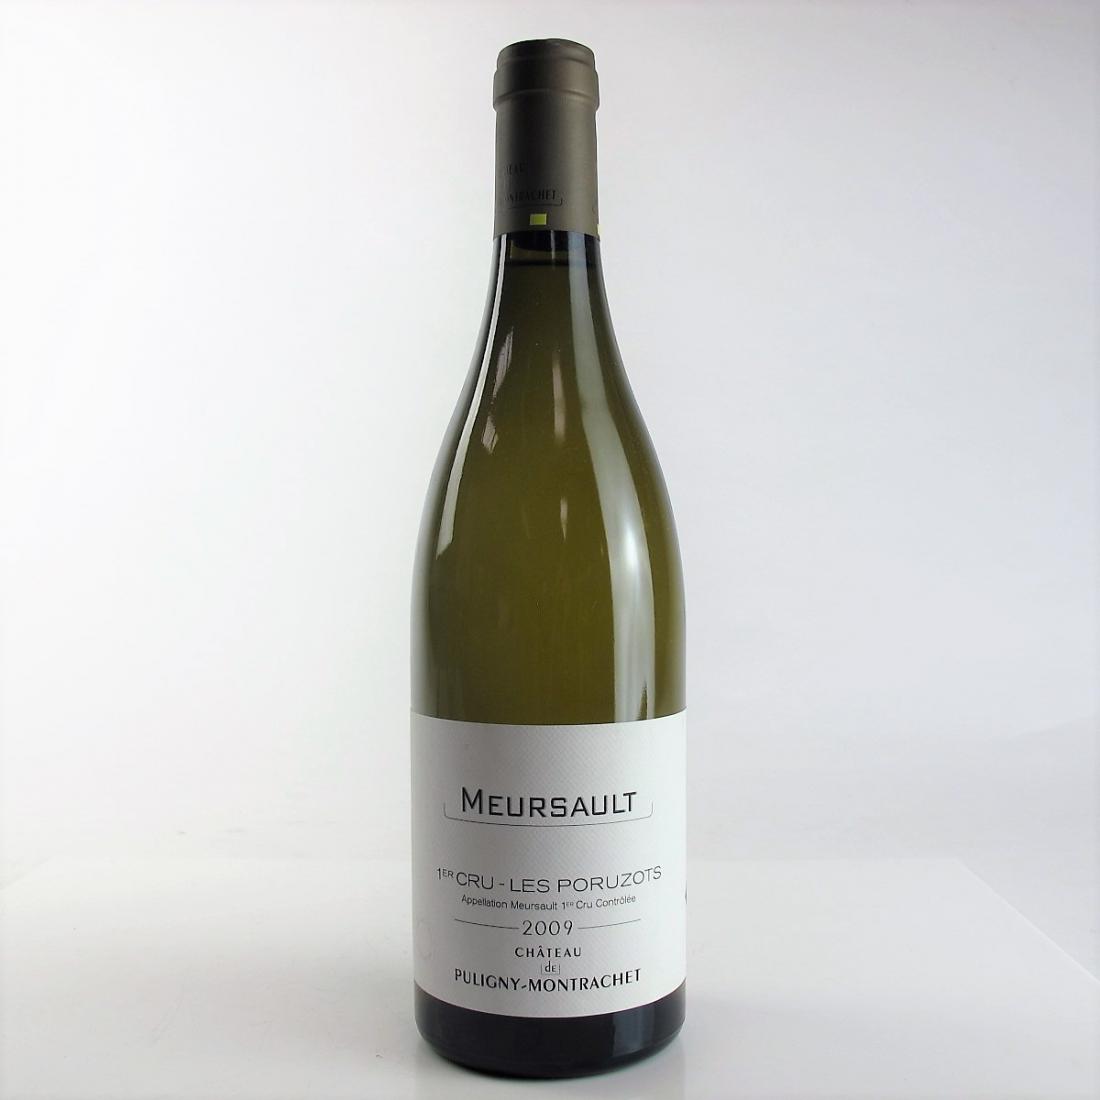 Ch. De Puligny-Montrachet 2009 Meursault